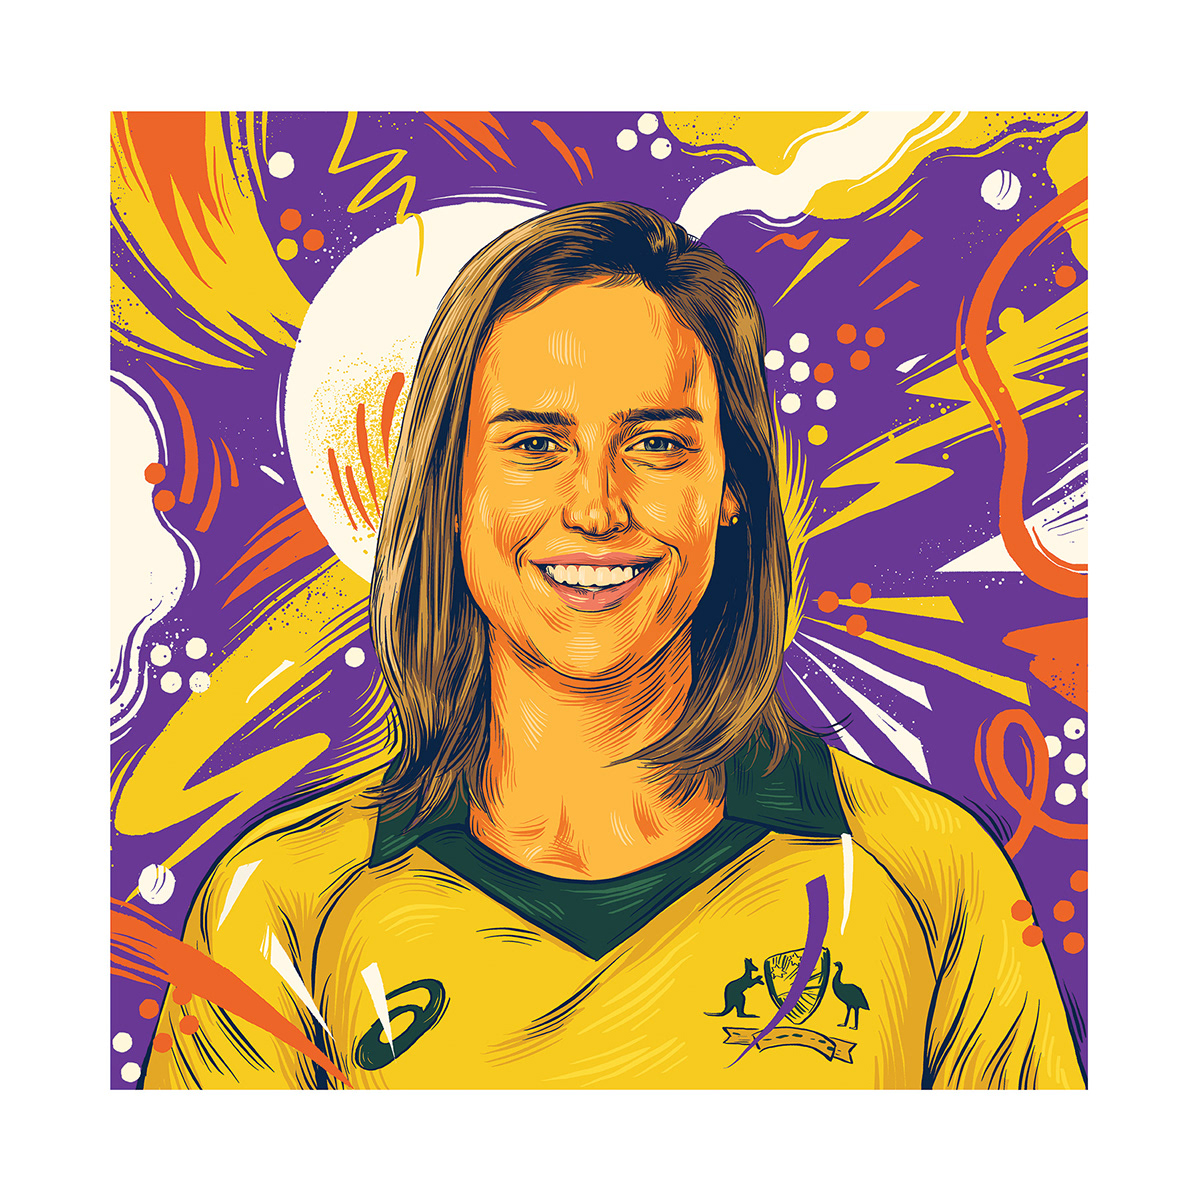 art artprint Cricket Digital Art  Drawing  ILLUSTRATION  painting   portratit sports sports illustration